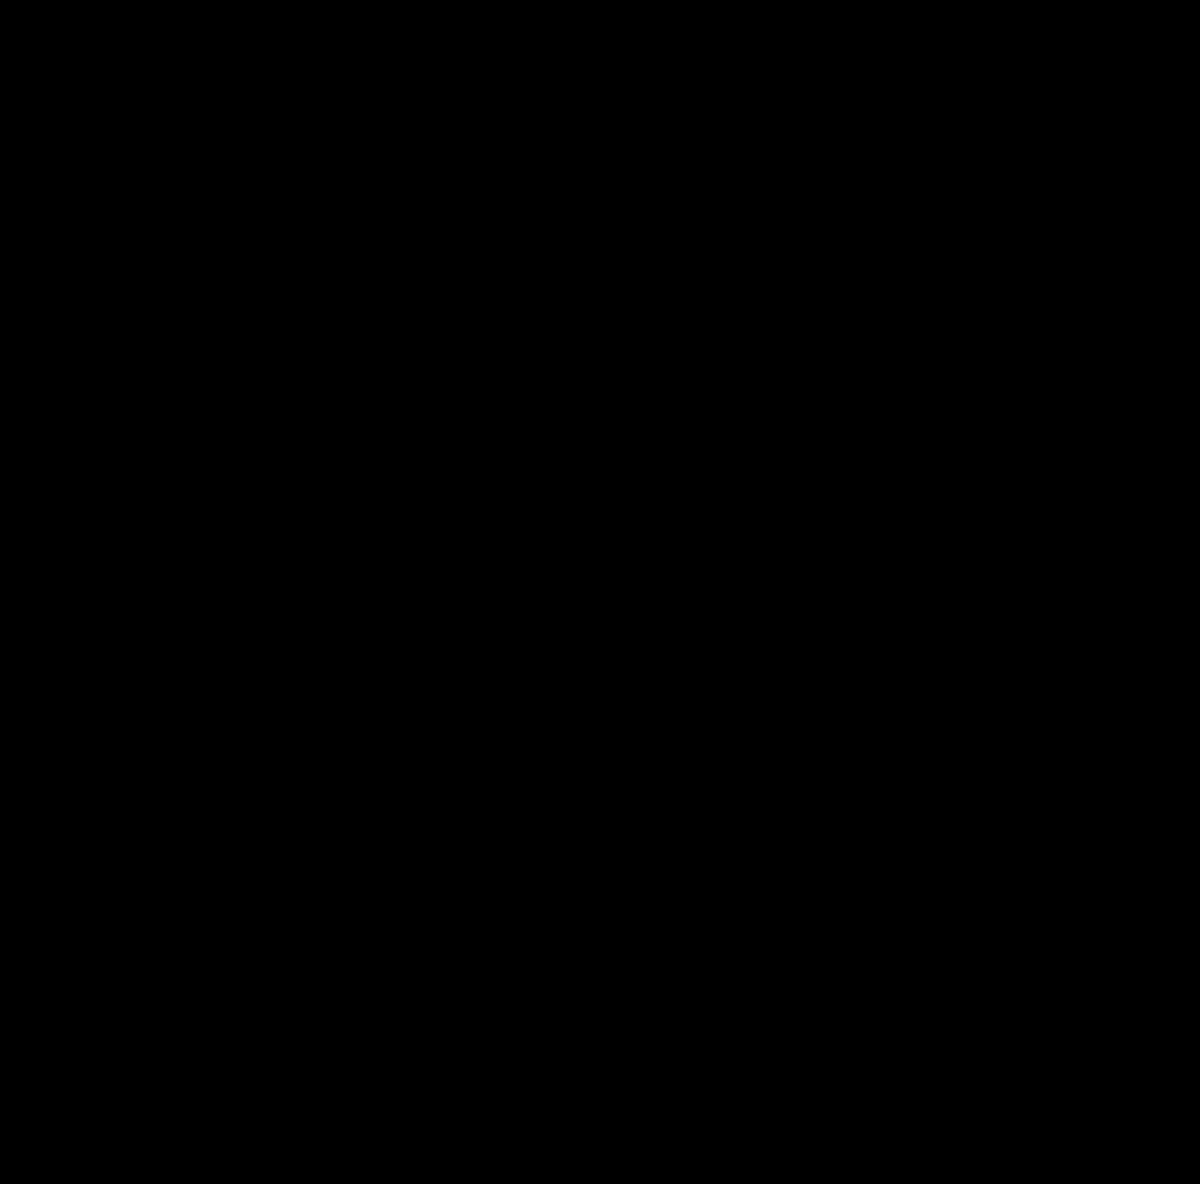 Eulers formula wikipedia owais art pinterest math eulers formula wikipedia ccuart Images